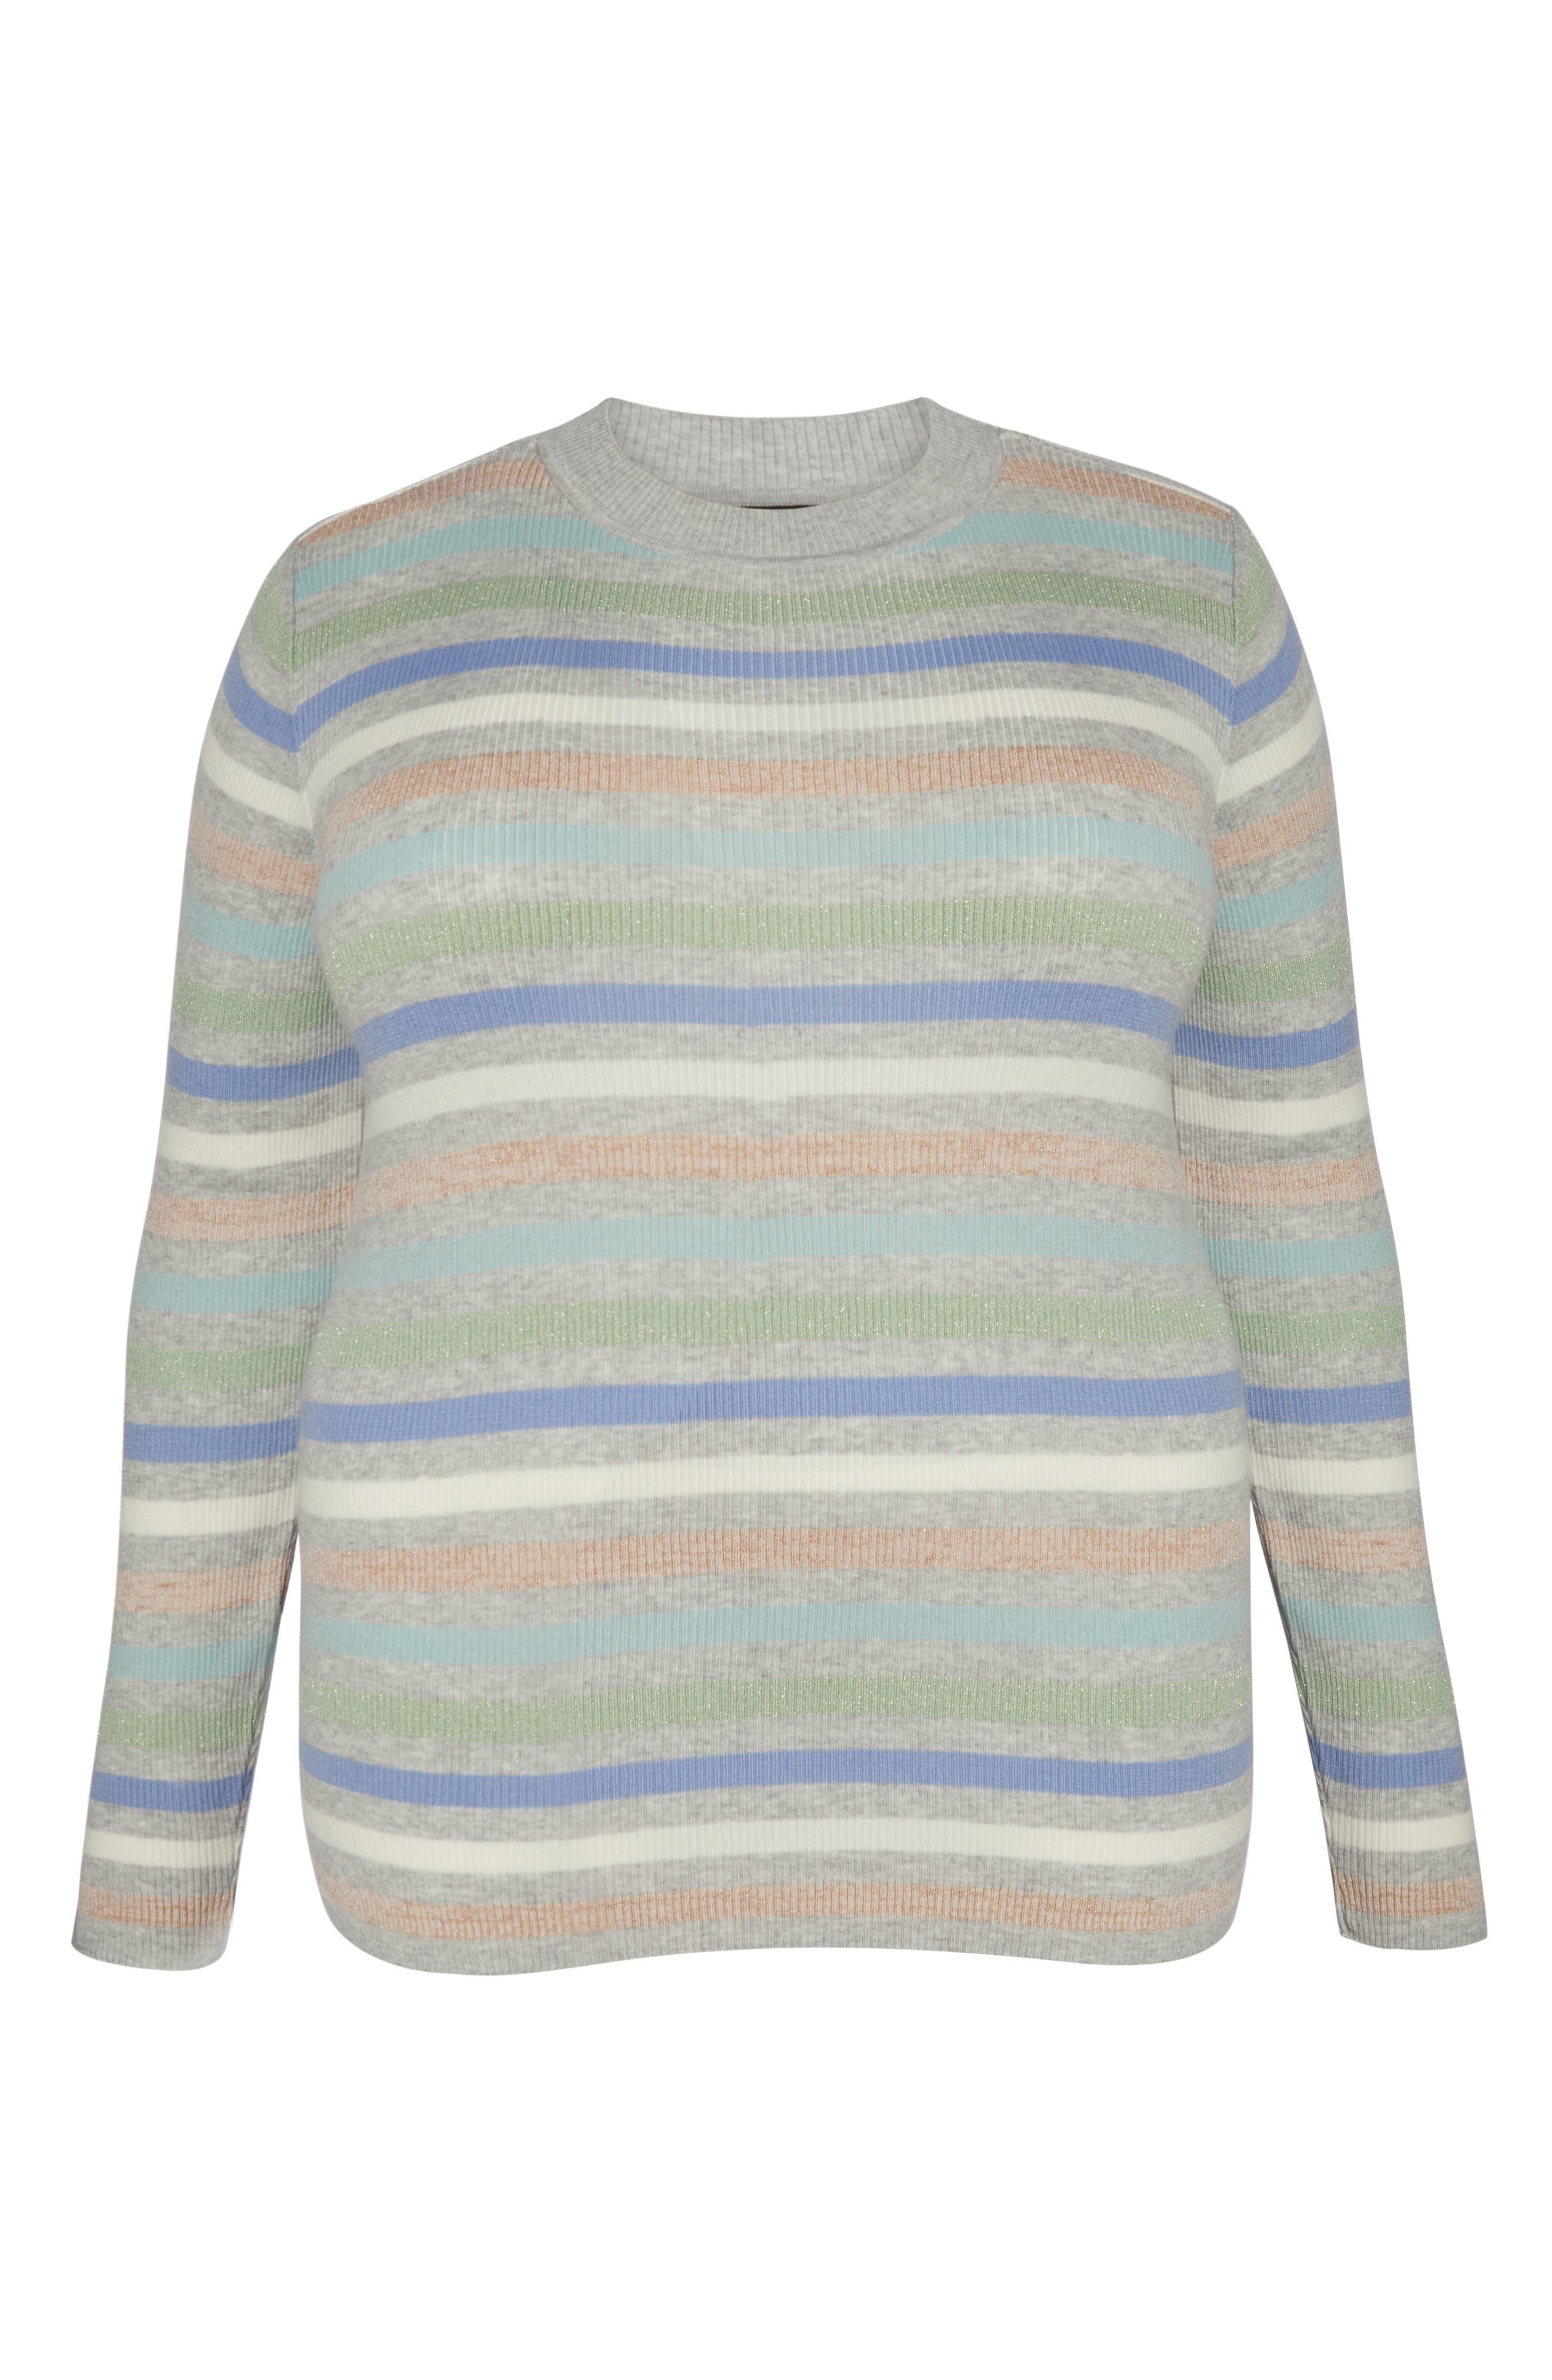 x Atlantic-Pacific Shimmer Stripe Sweater,                             Alternate thumbnail 6, color,                             GREY MULTI STRIPE